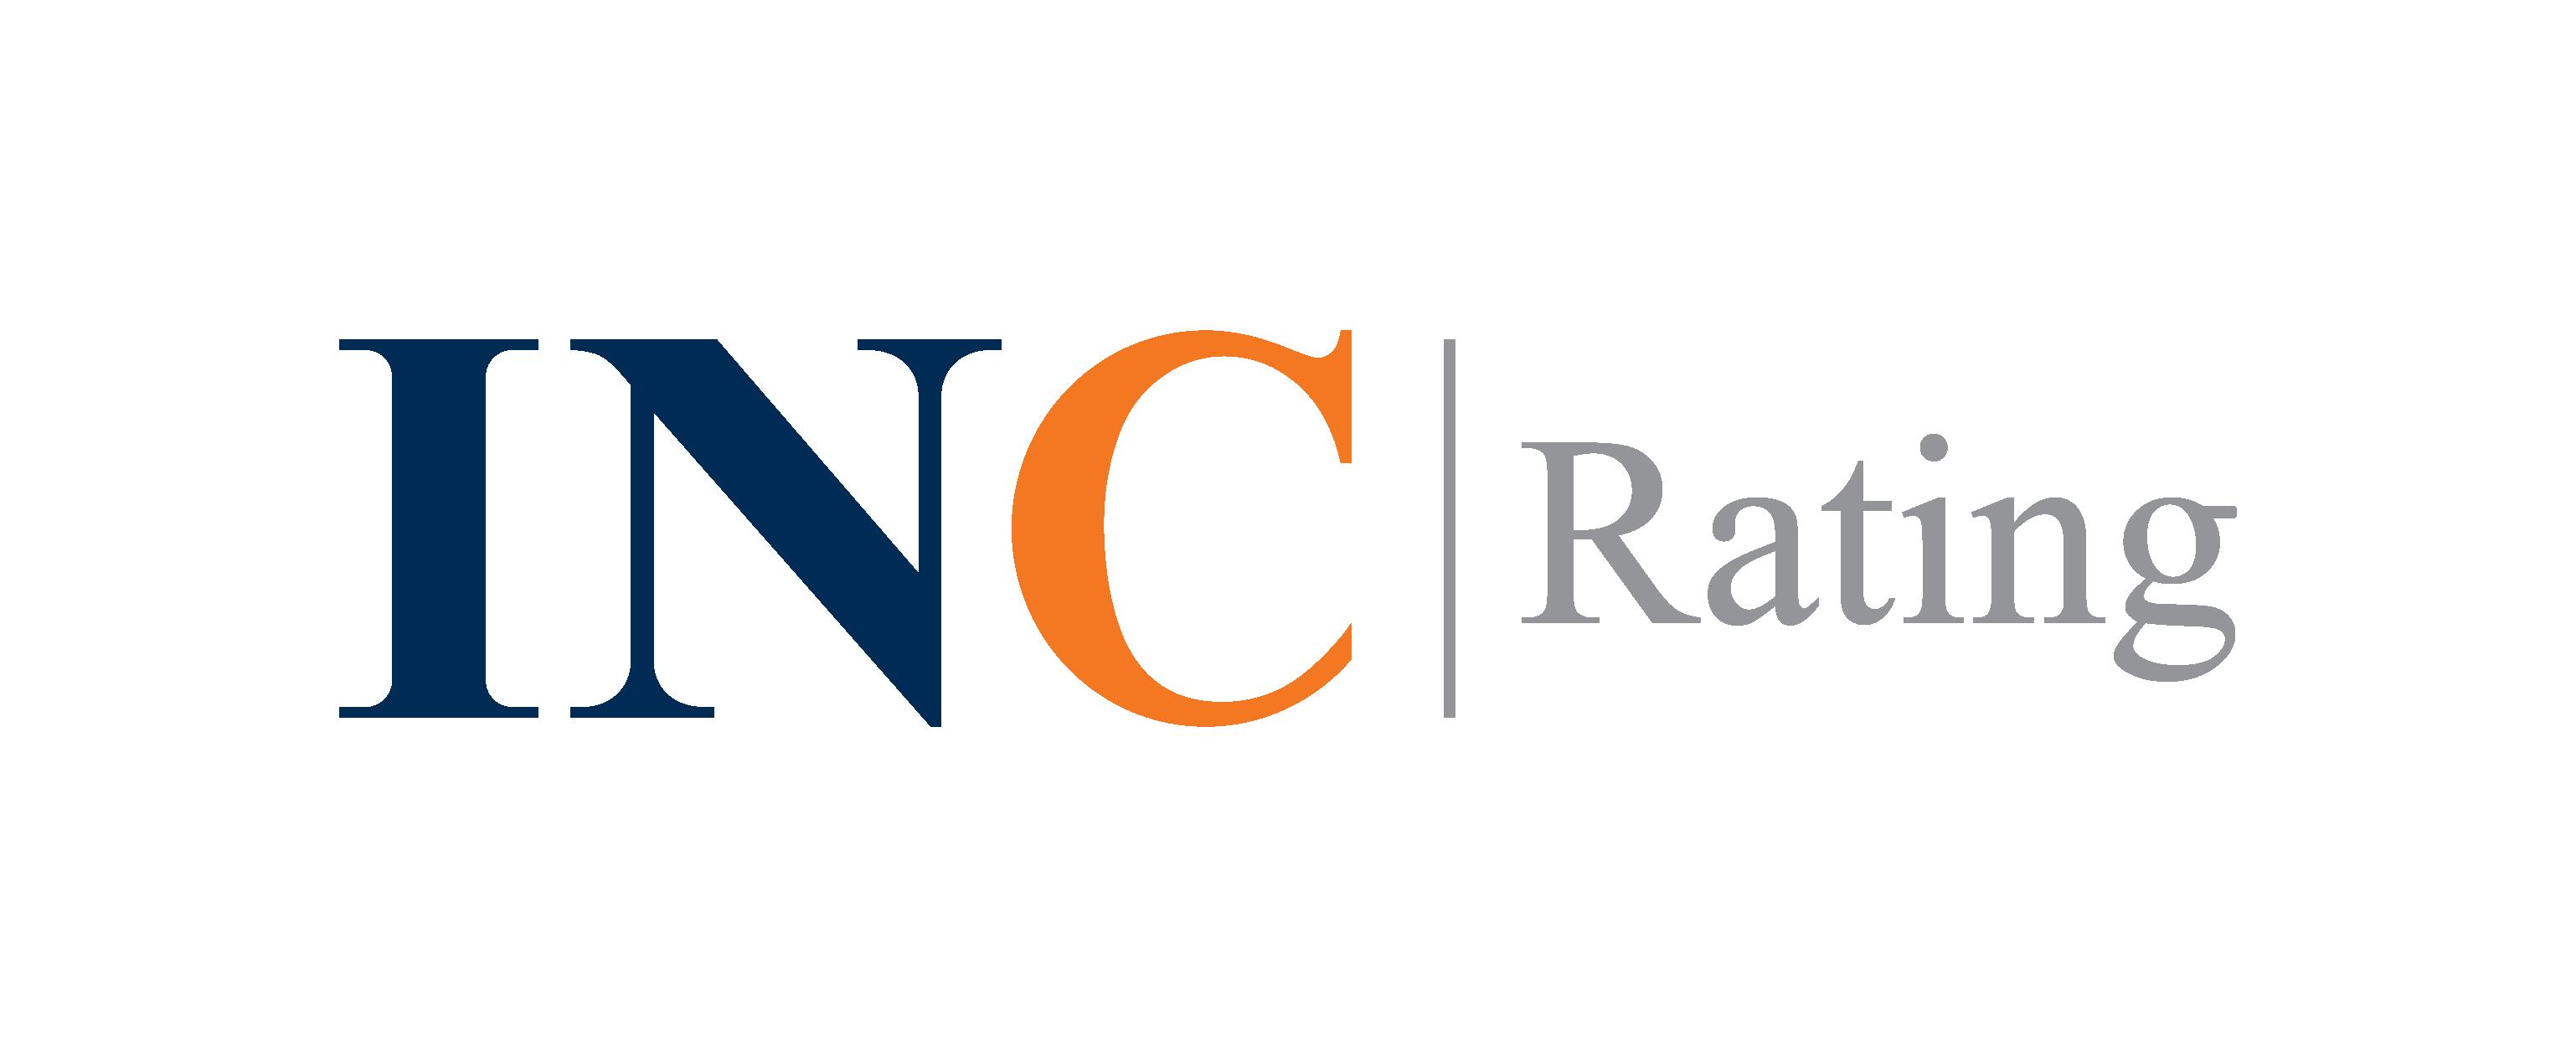 INC_RGB_Rating3